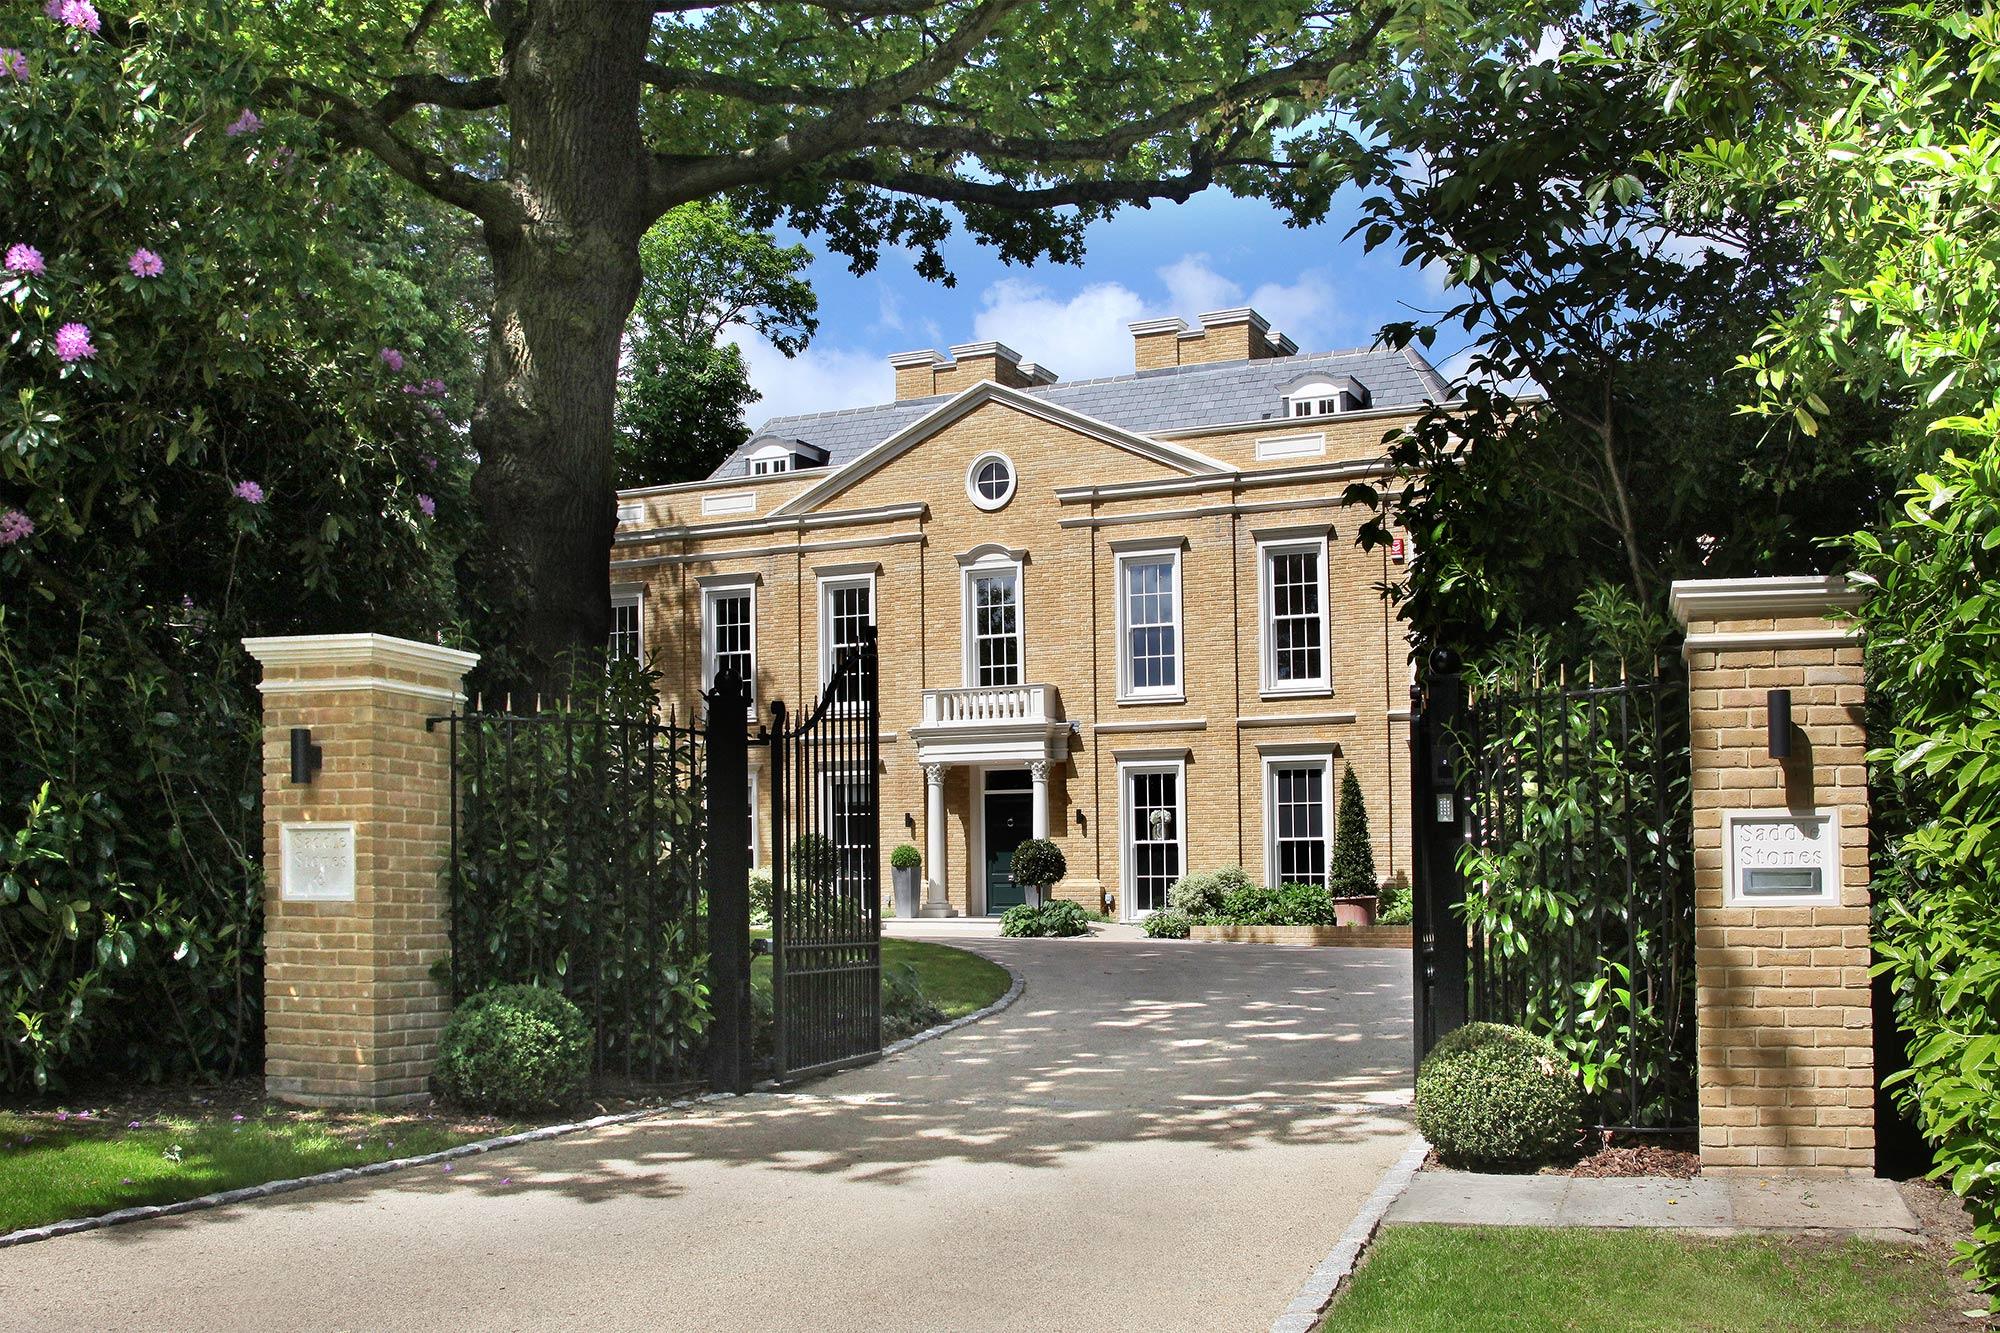 7 bed luxury property st george 39 s hill estate weybridge octagon properties 10 million kt13 0pz